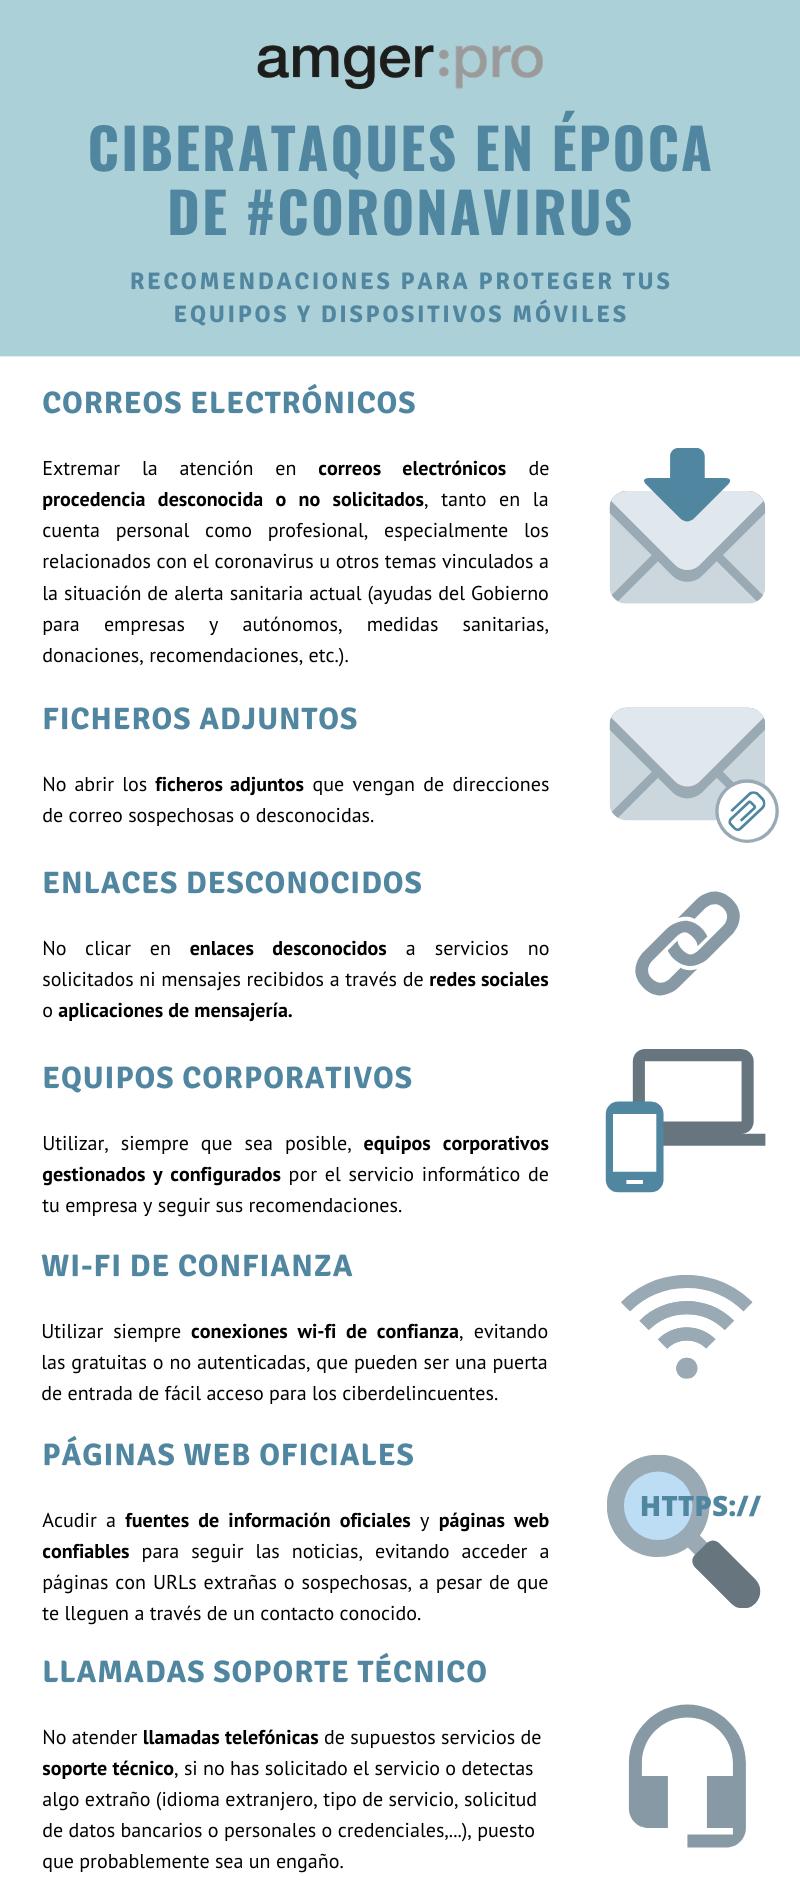 amgerpro_infografia recomendaciones ciberseguridad